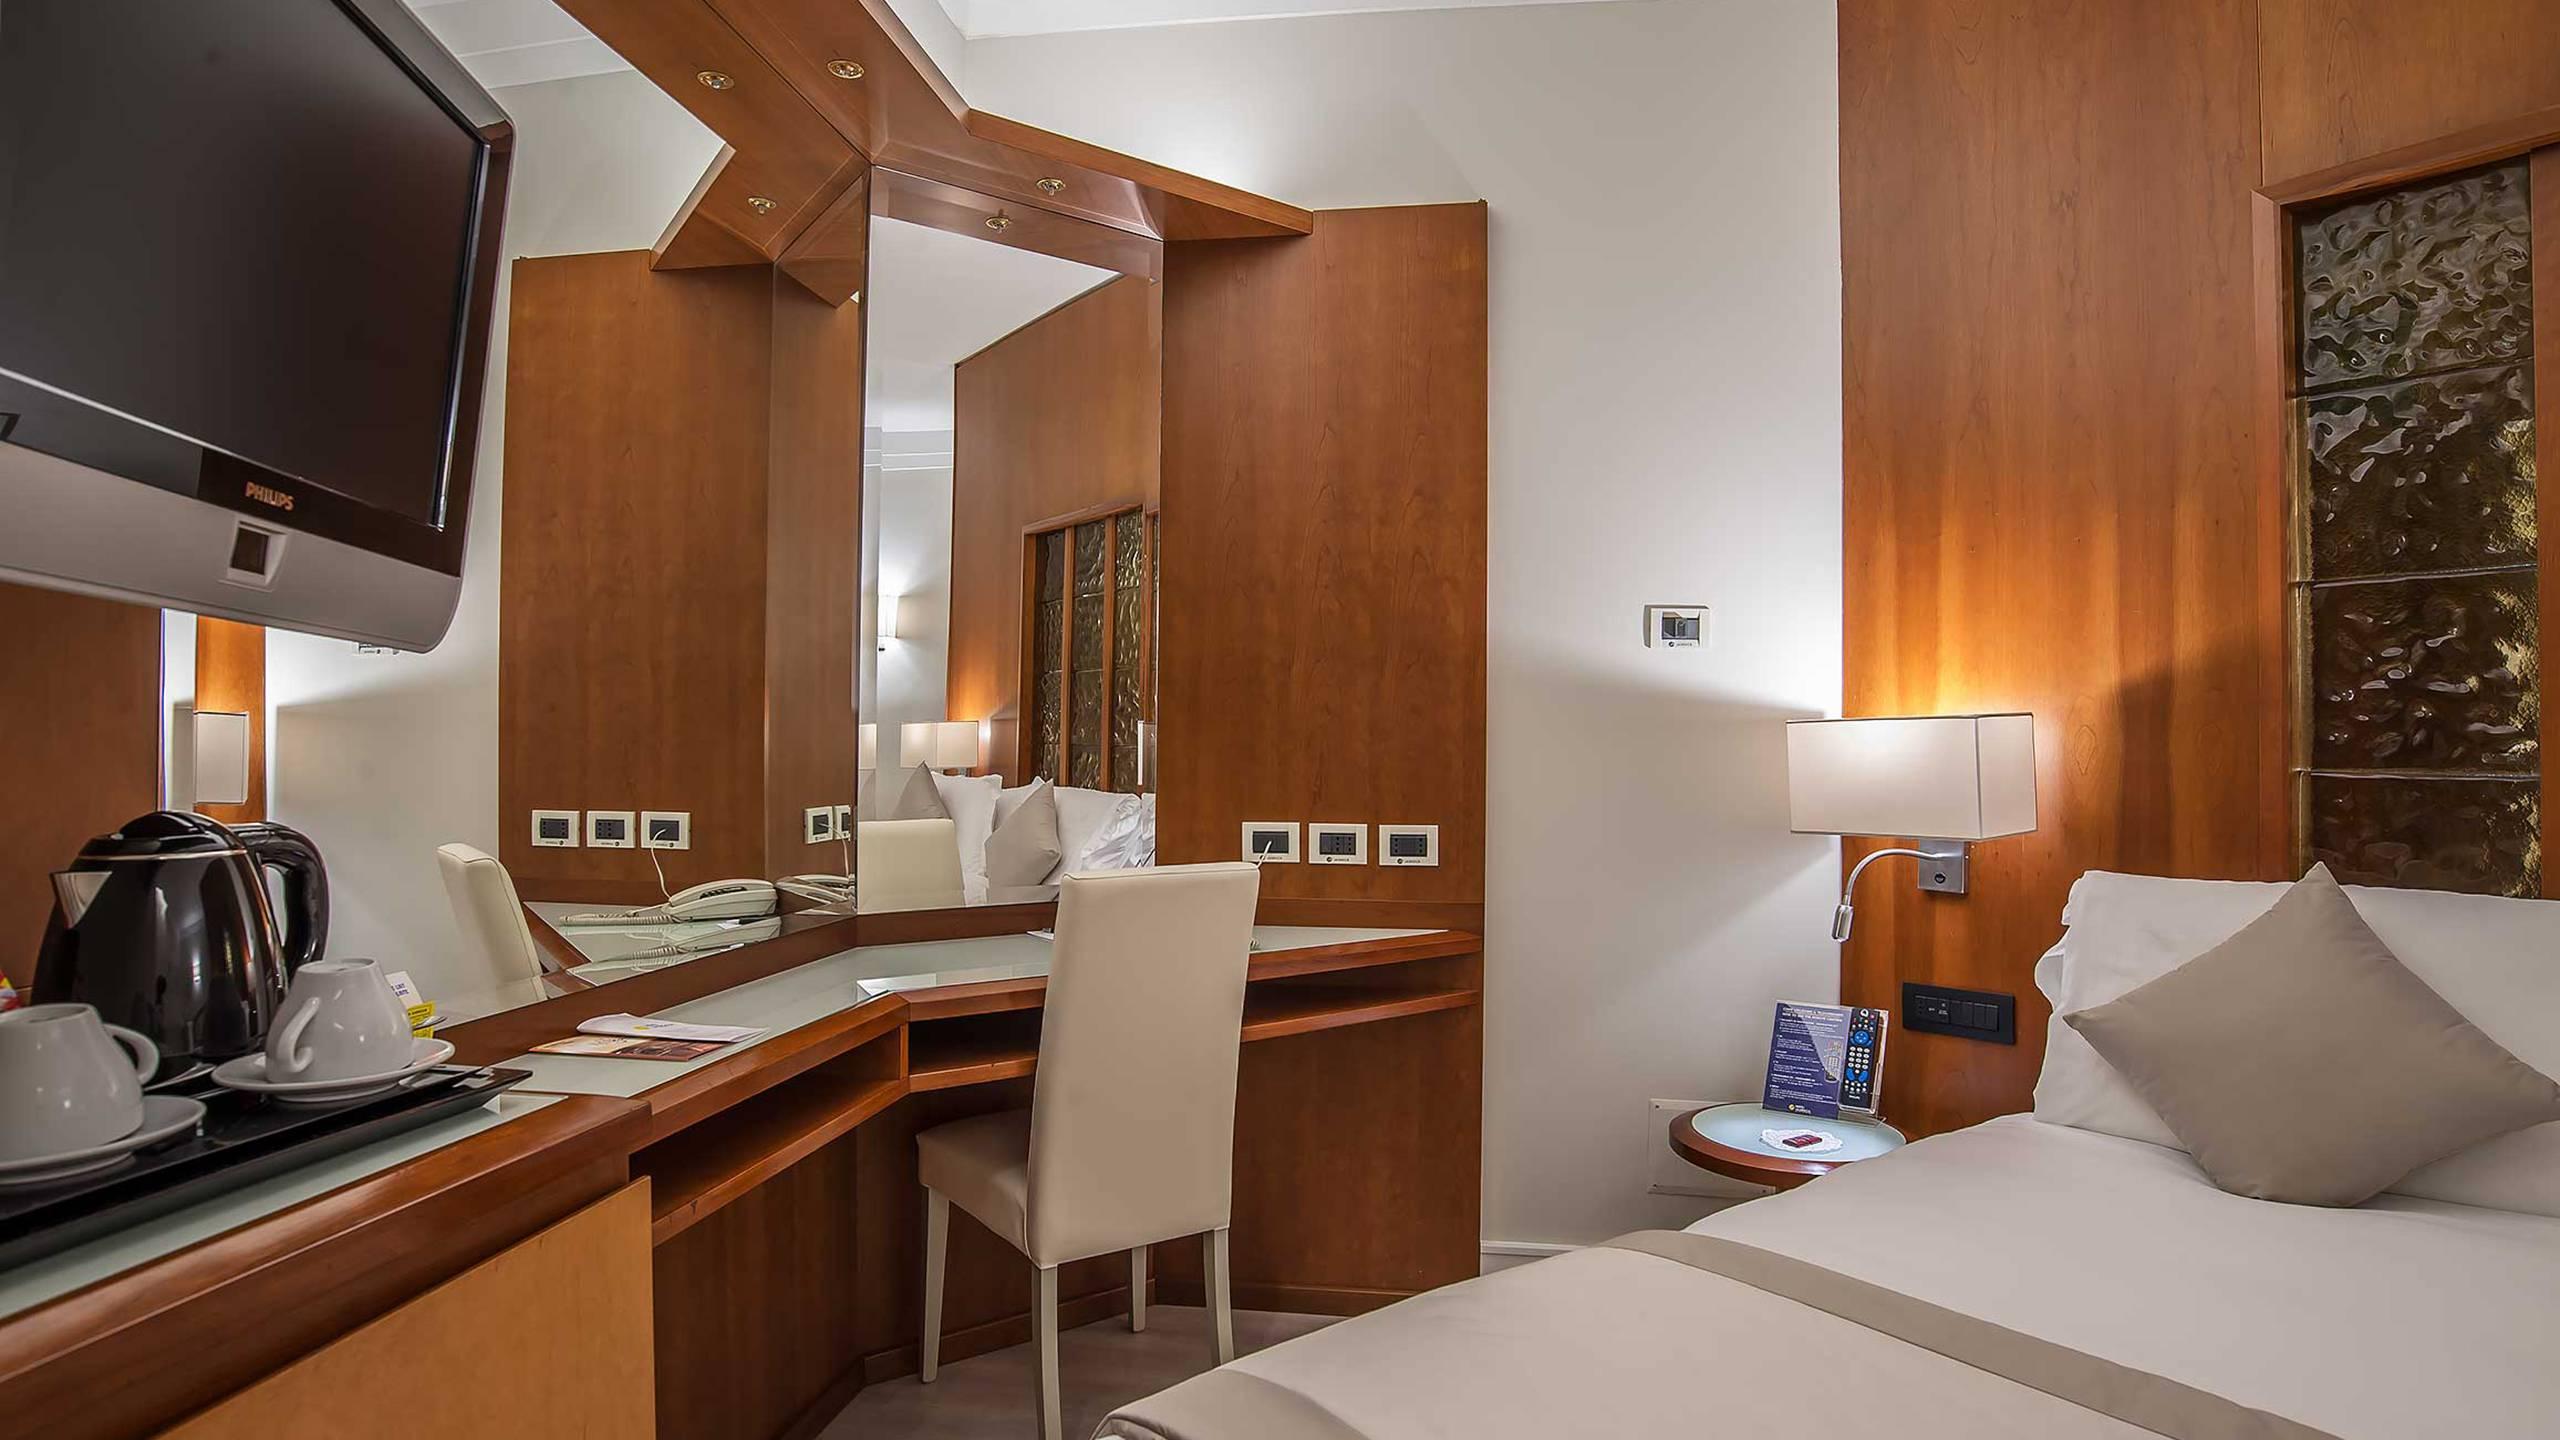 Hotel-La-Giocca-Roma-junior-suite